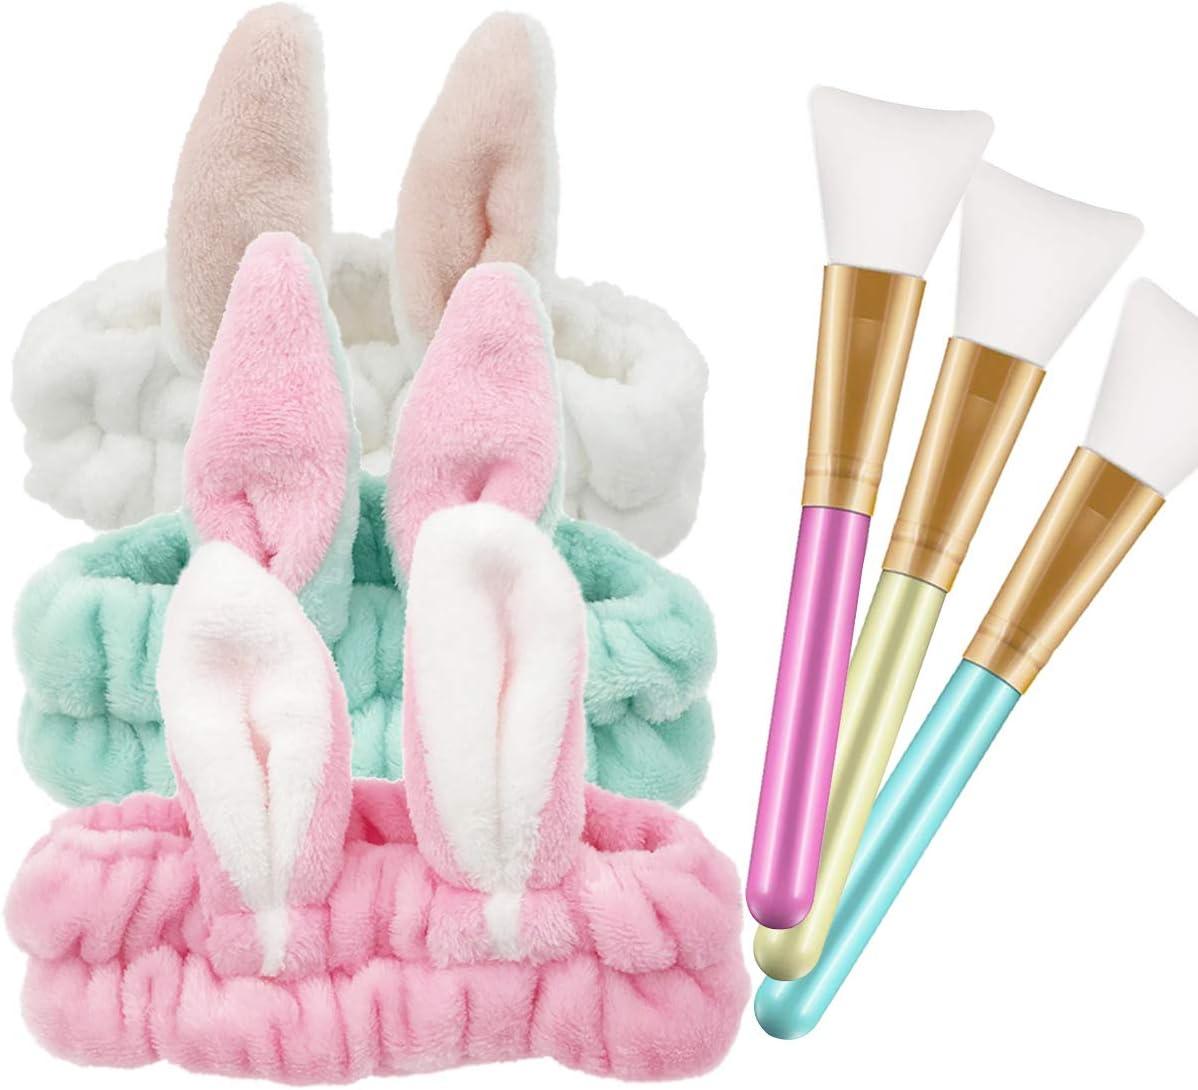 Pinceles de Mascarilla,Zuzer 3pcs Brochas Maquillaje Facial & 3pcs Venda de Pelo Mujer Diademas Pelo Banda Maquillaje para Niña Mujer Facial